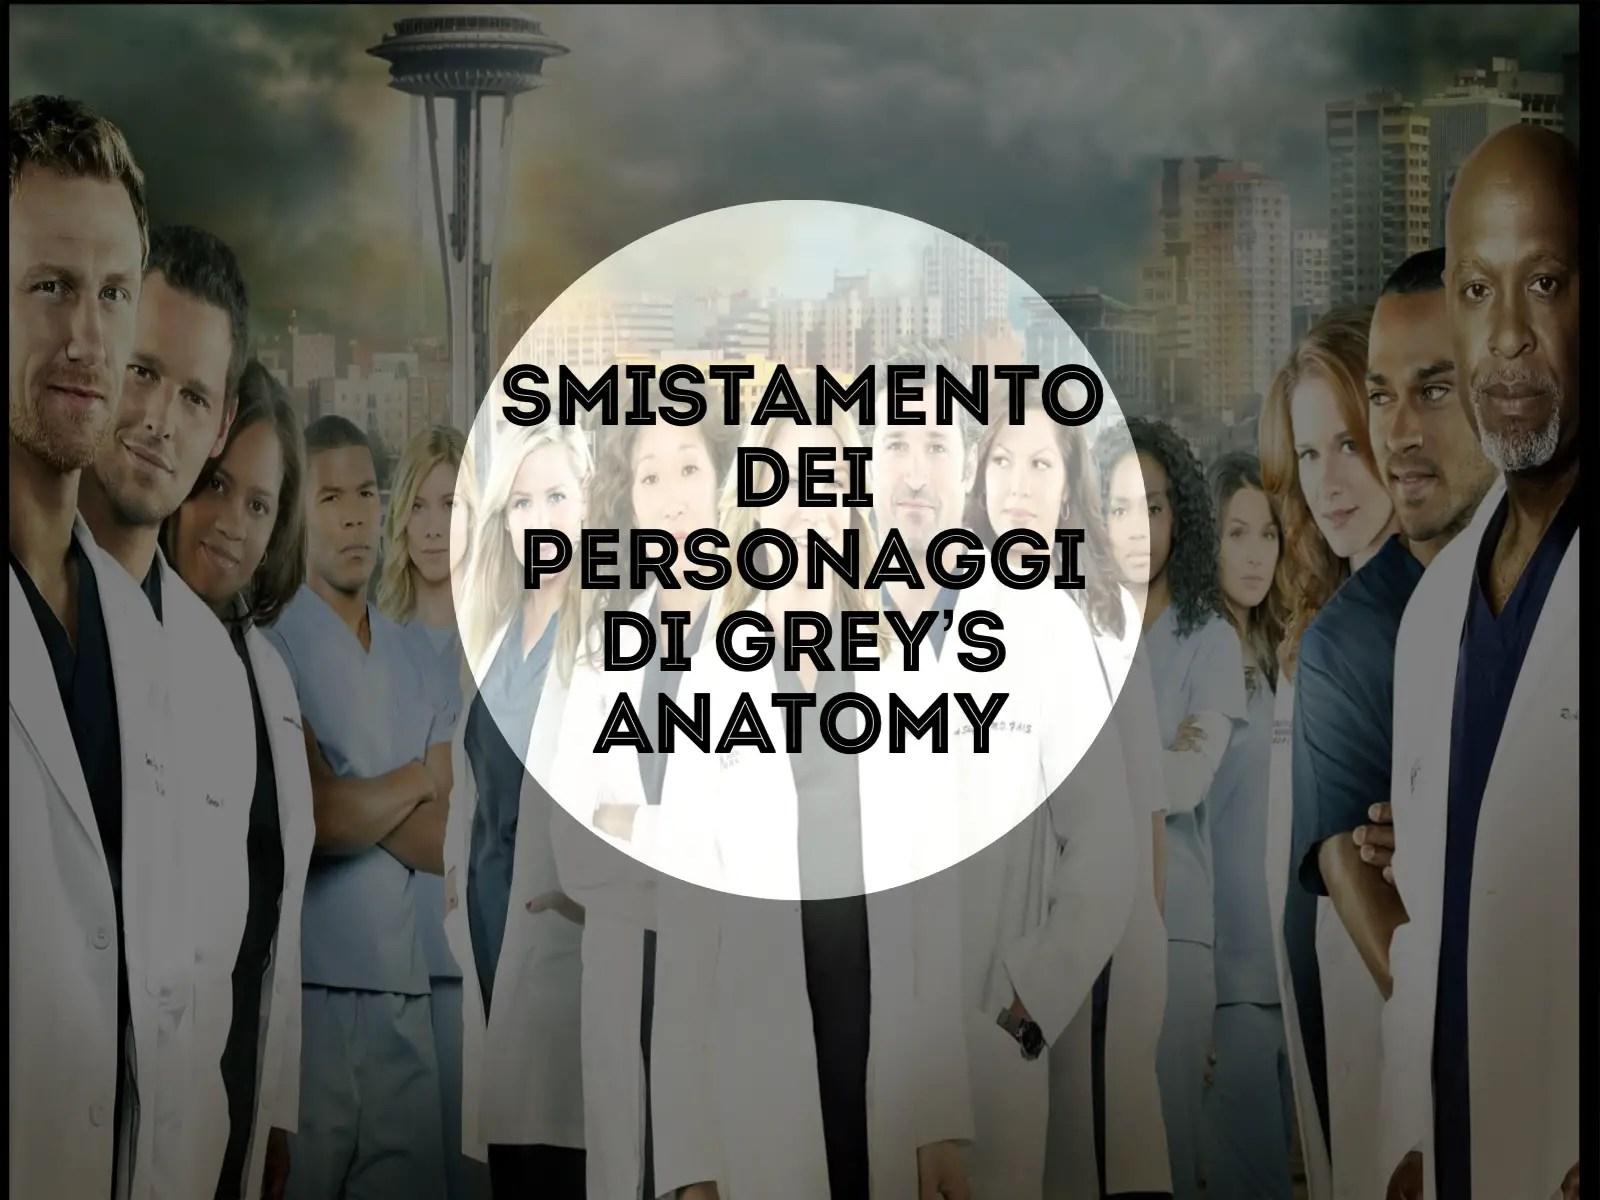 Grey's anatomy, rifatta